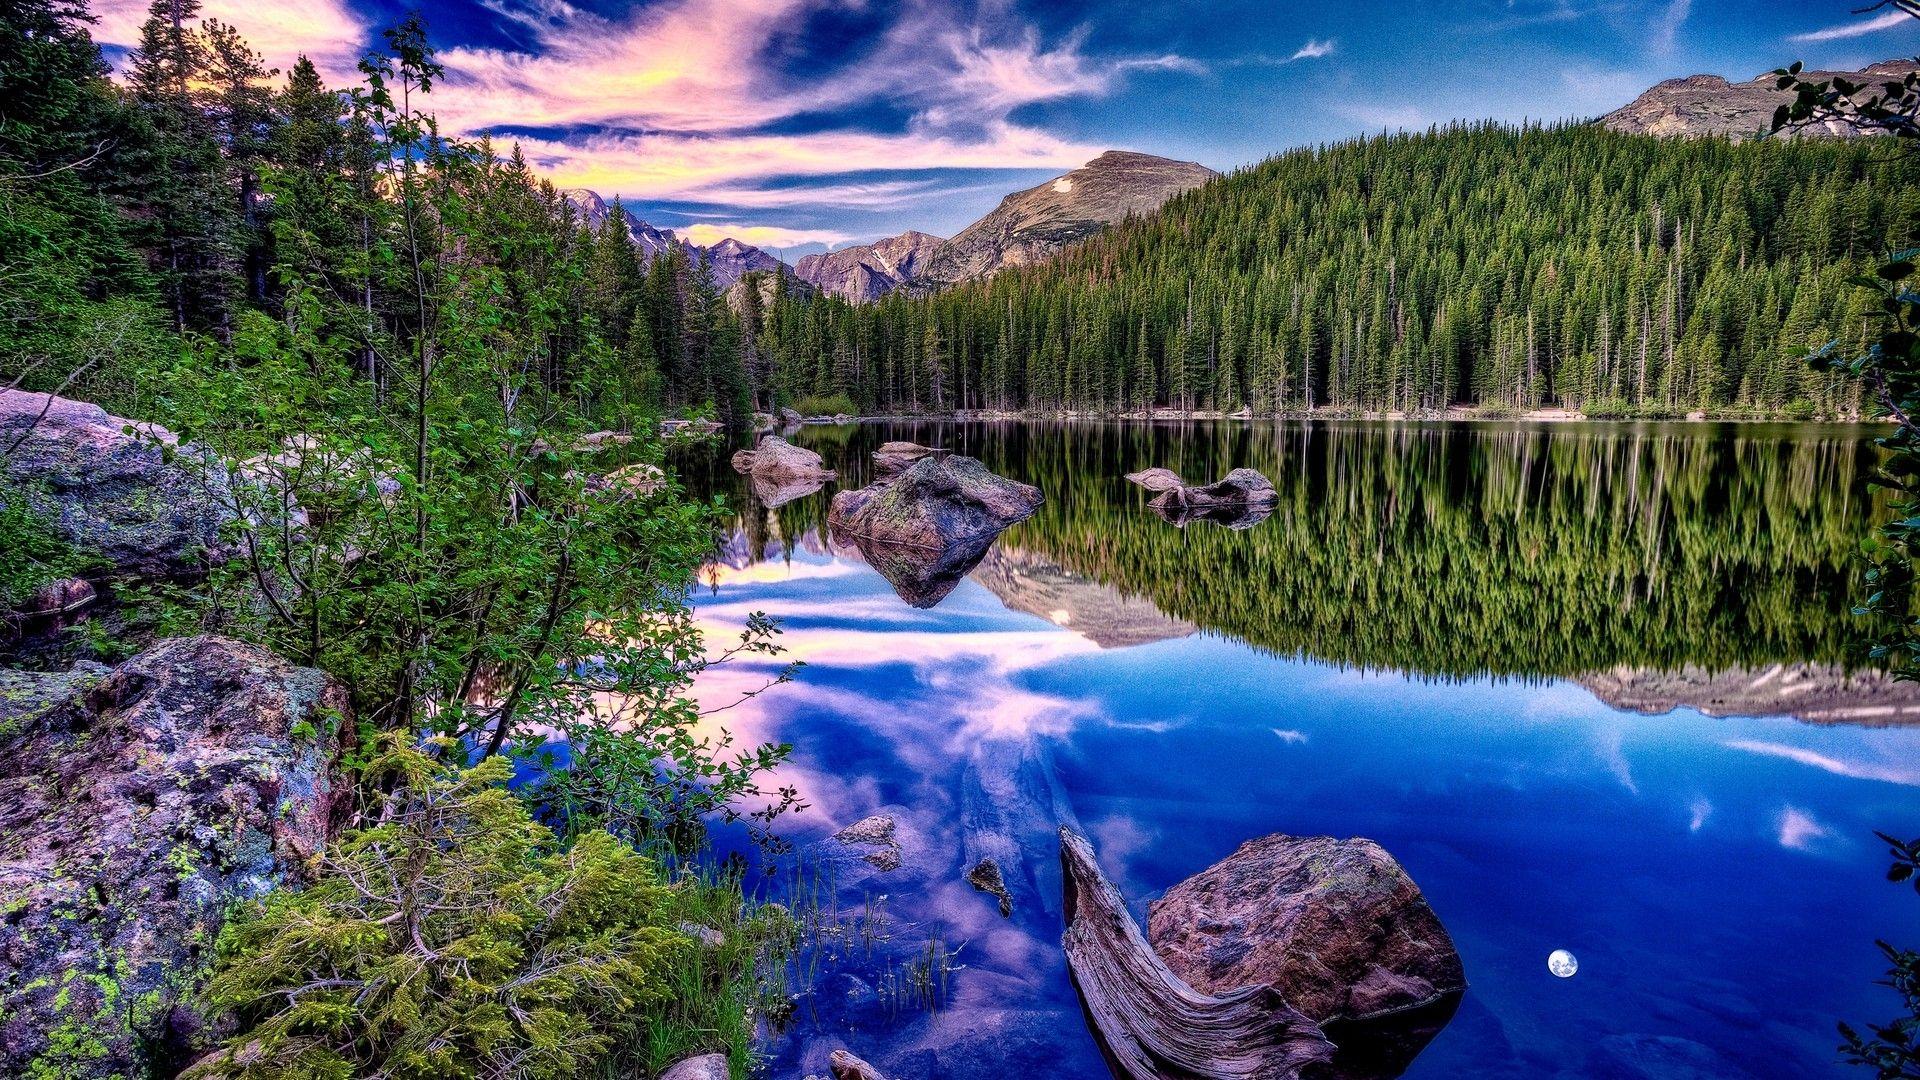 Beautiful Scenery Of Nature